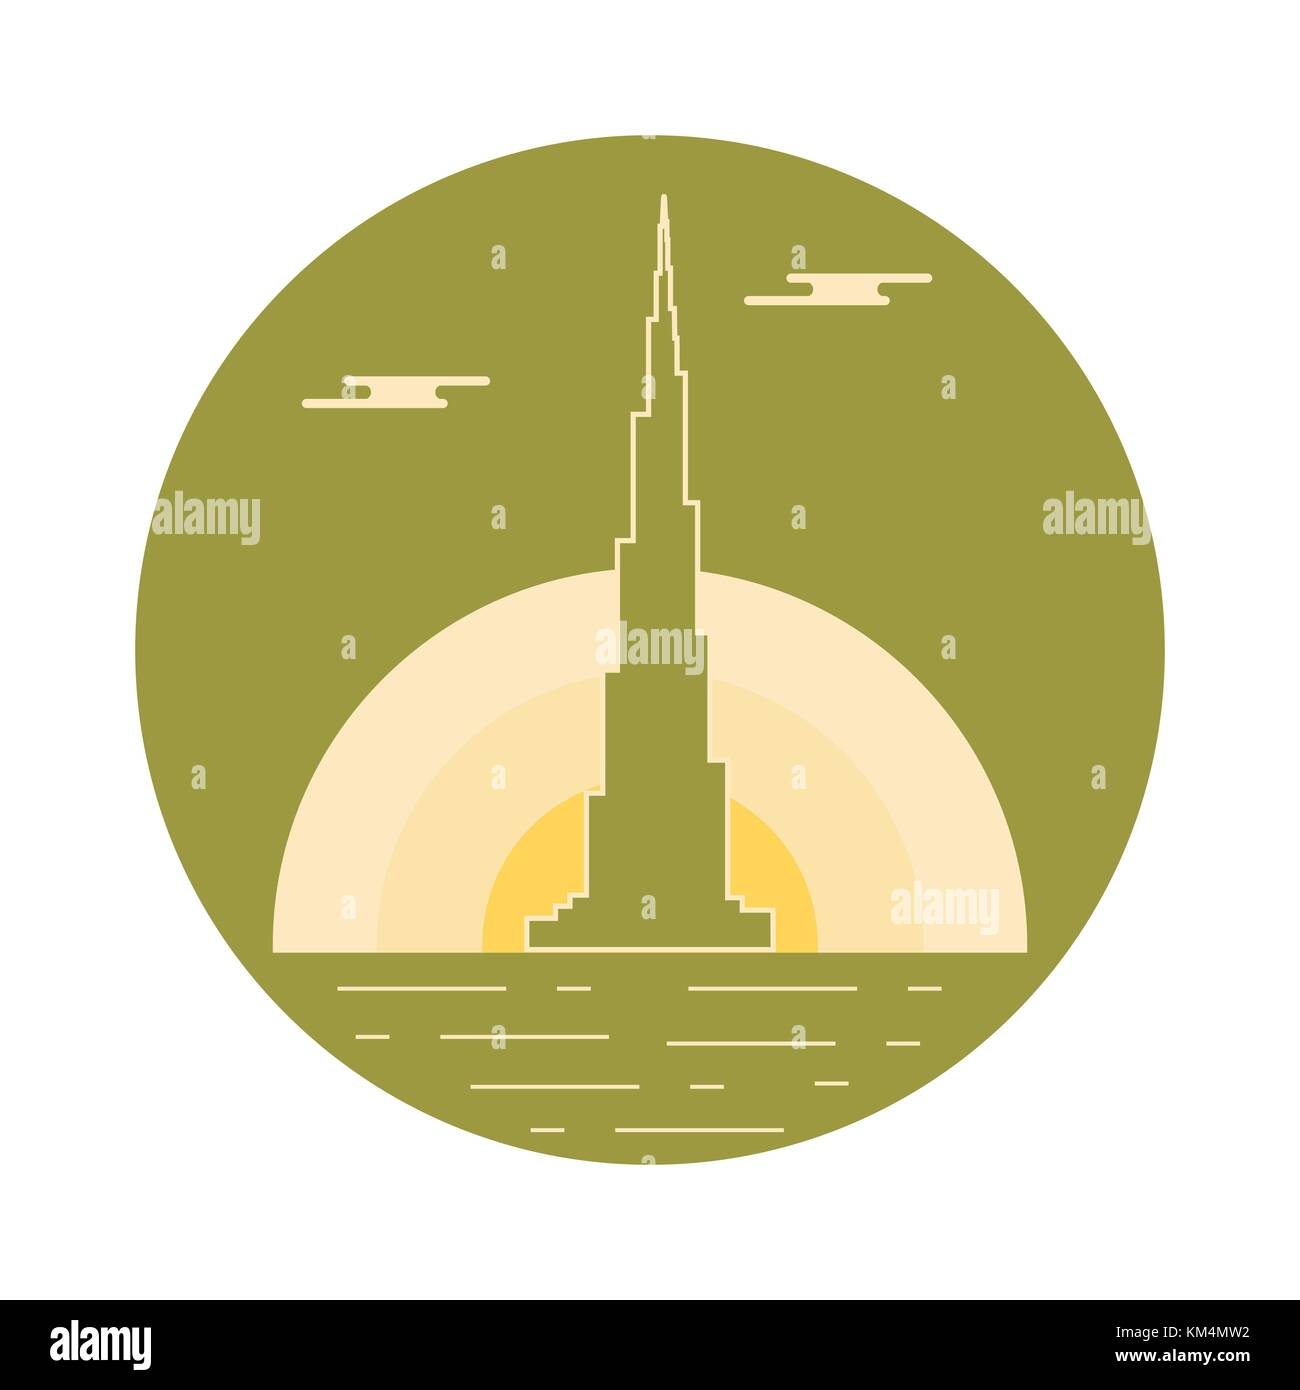 United Arab Emirates skyscraper silhouette. Dubai famous building and symbol. Design for banner, poster or print. - Stock Image